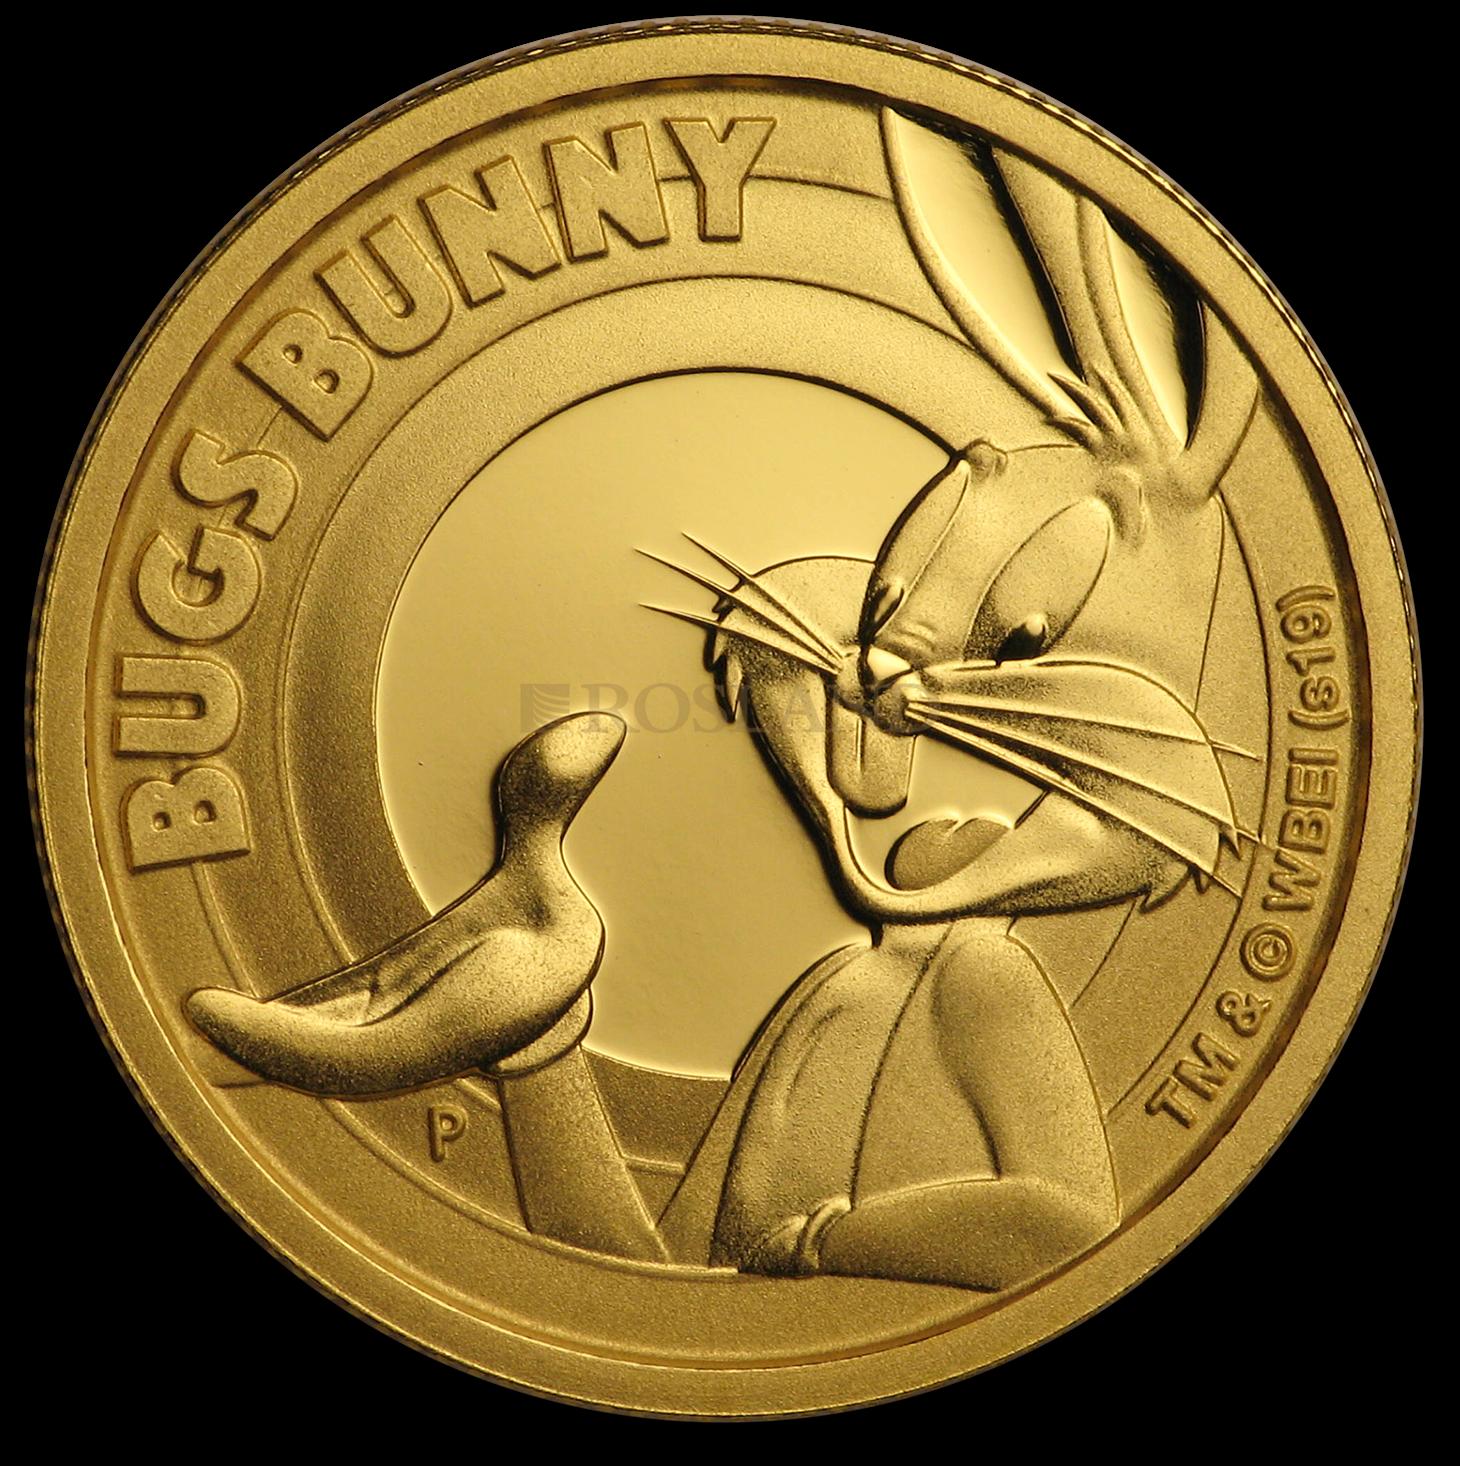 1/4 Unze Goldmünze Tuvalu Looney Tunes - Bugs Bunny 2019 PP (Box, Zertifikat)